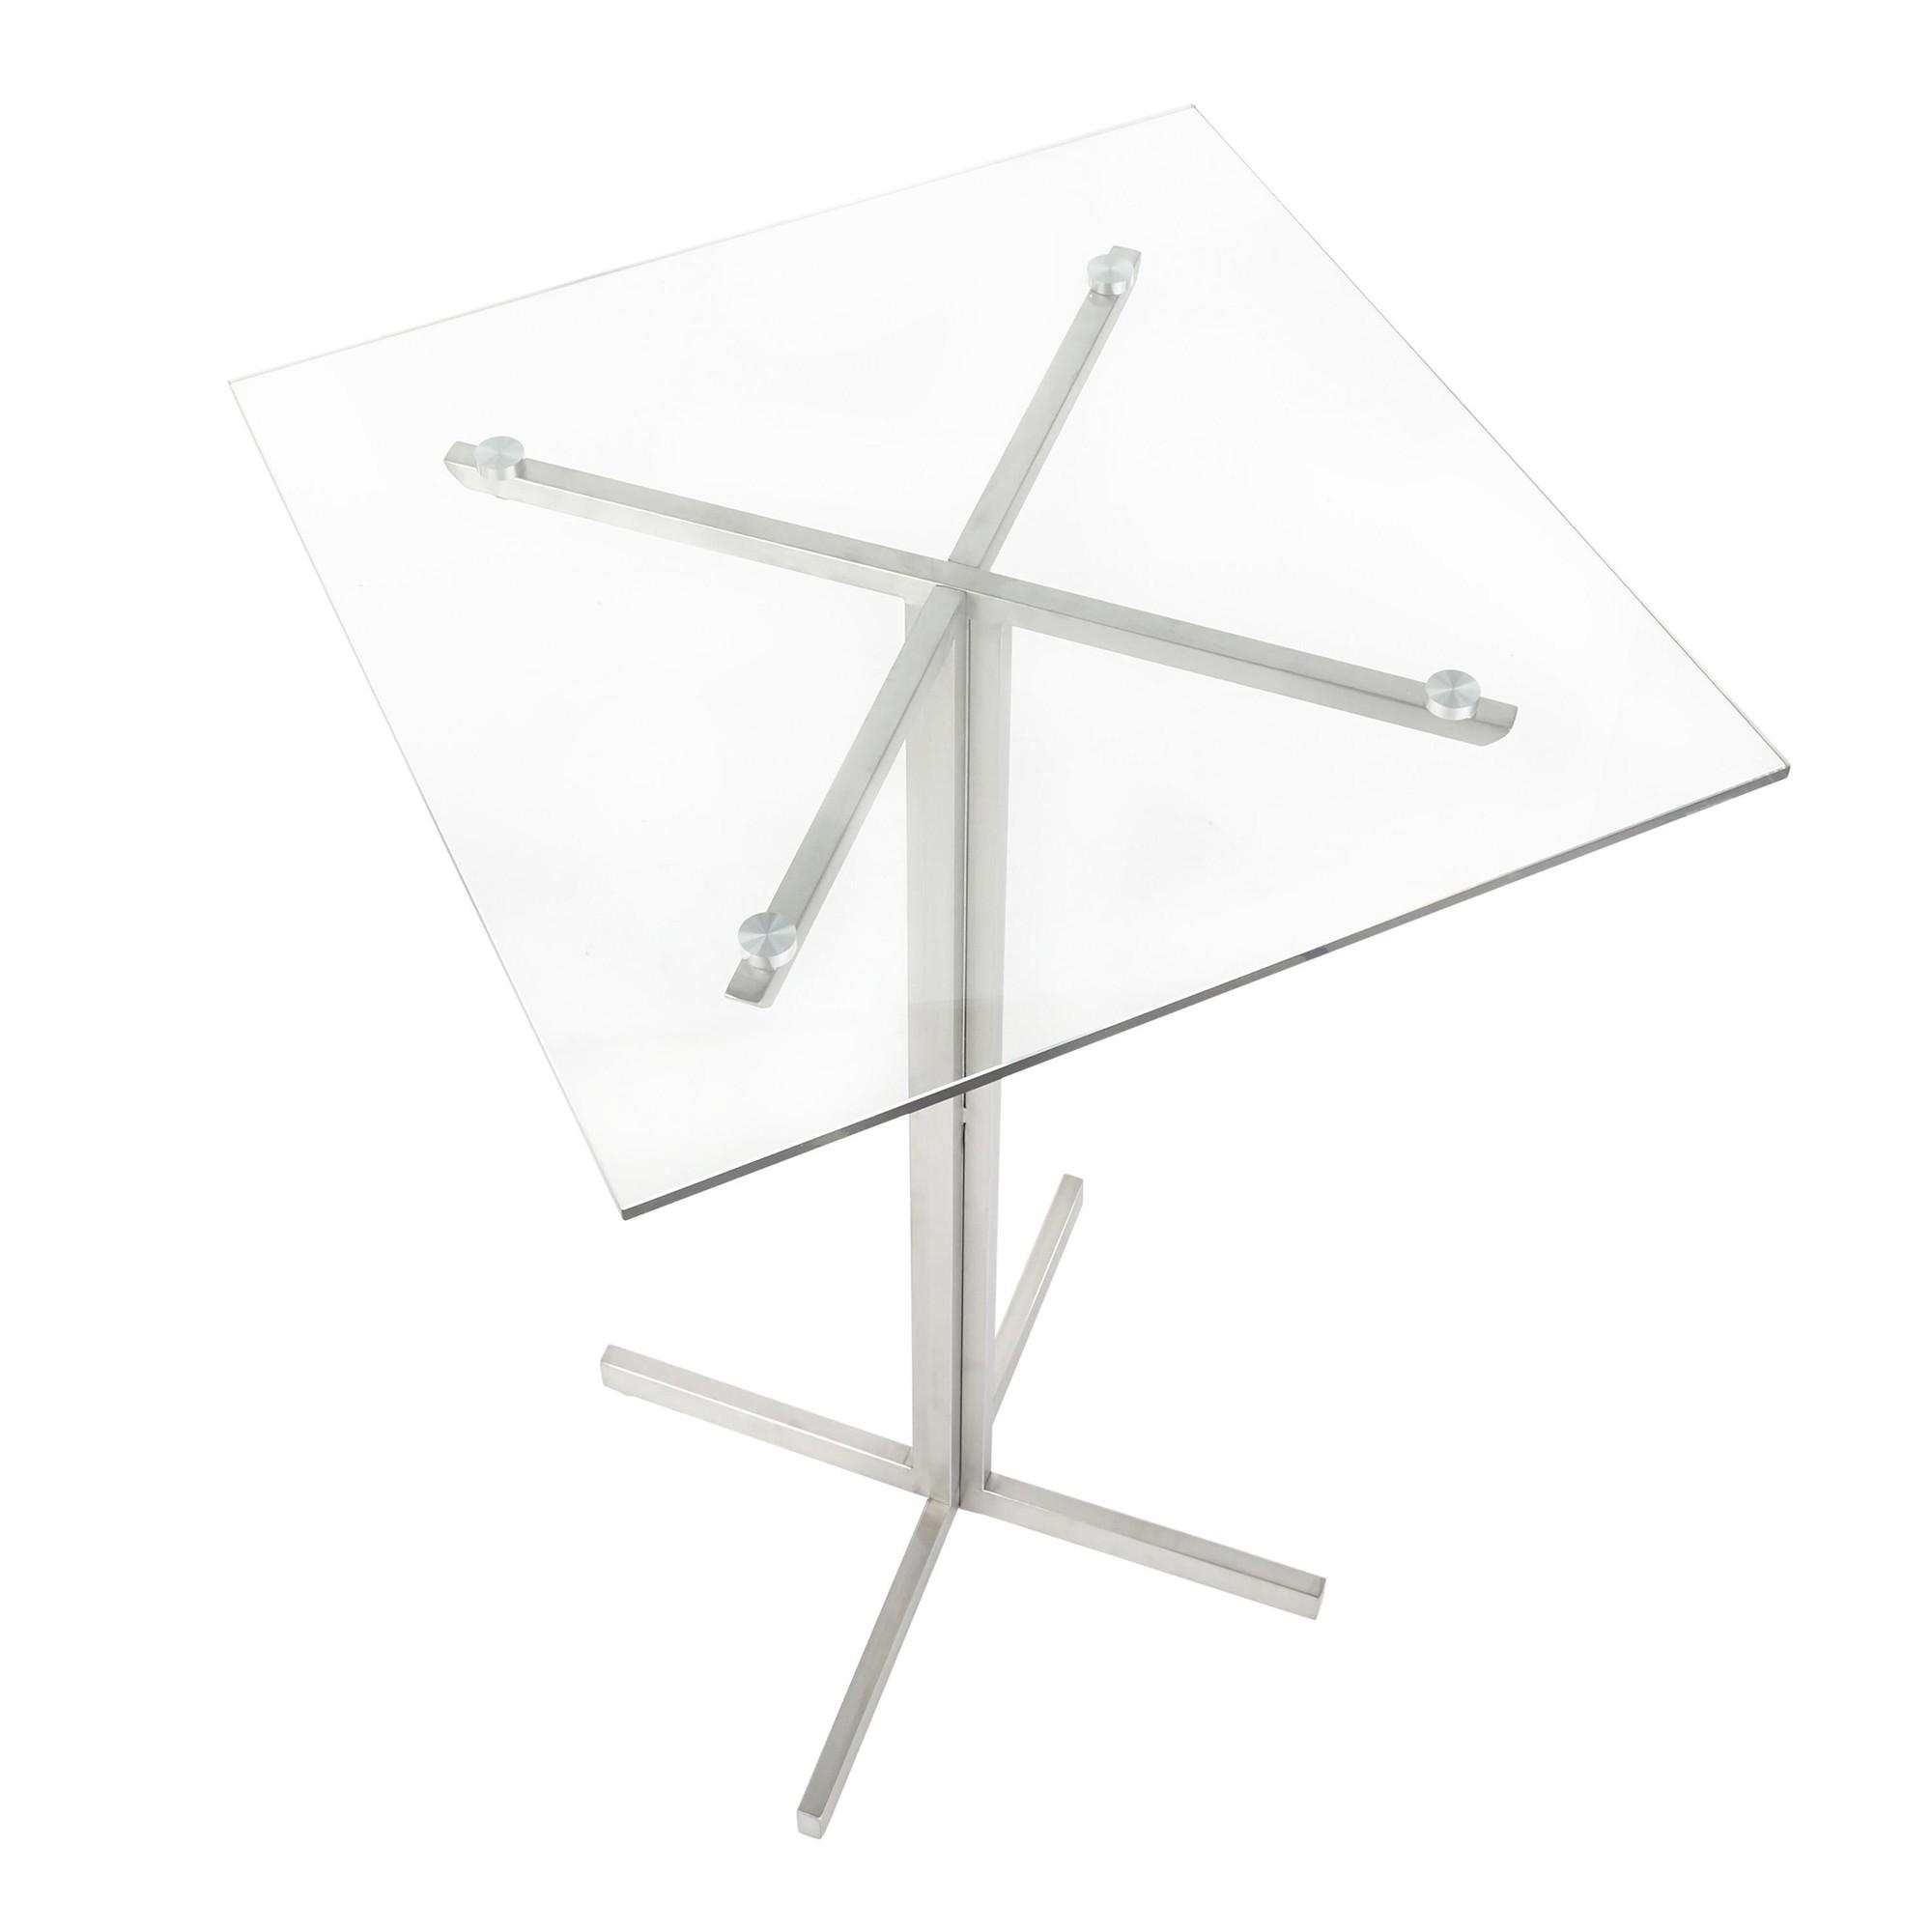 Fuji Square Bar Table Lumisource Stylish Decor At